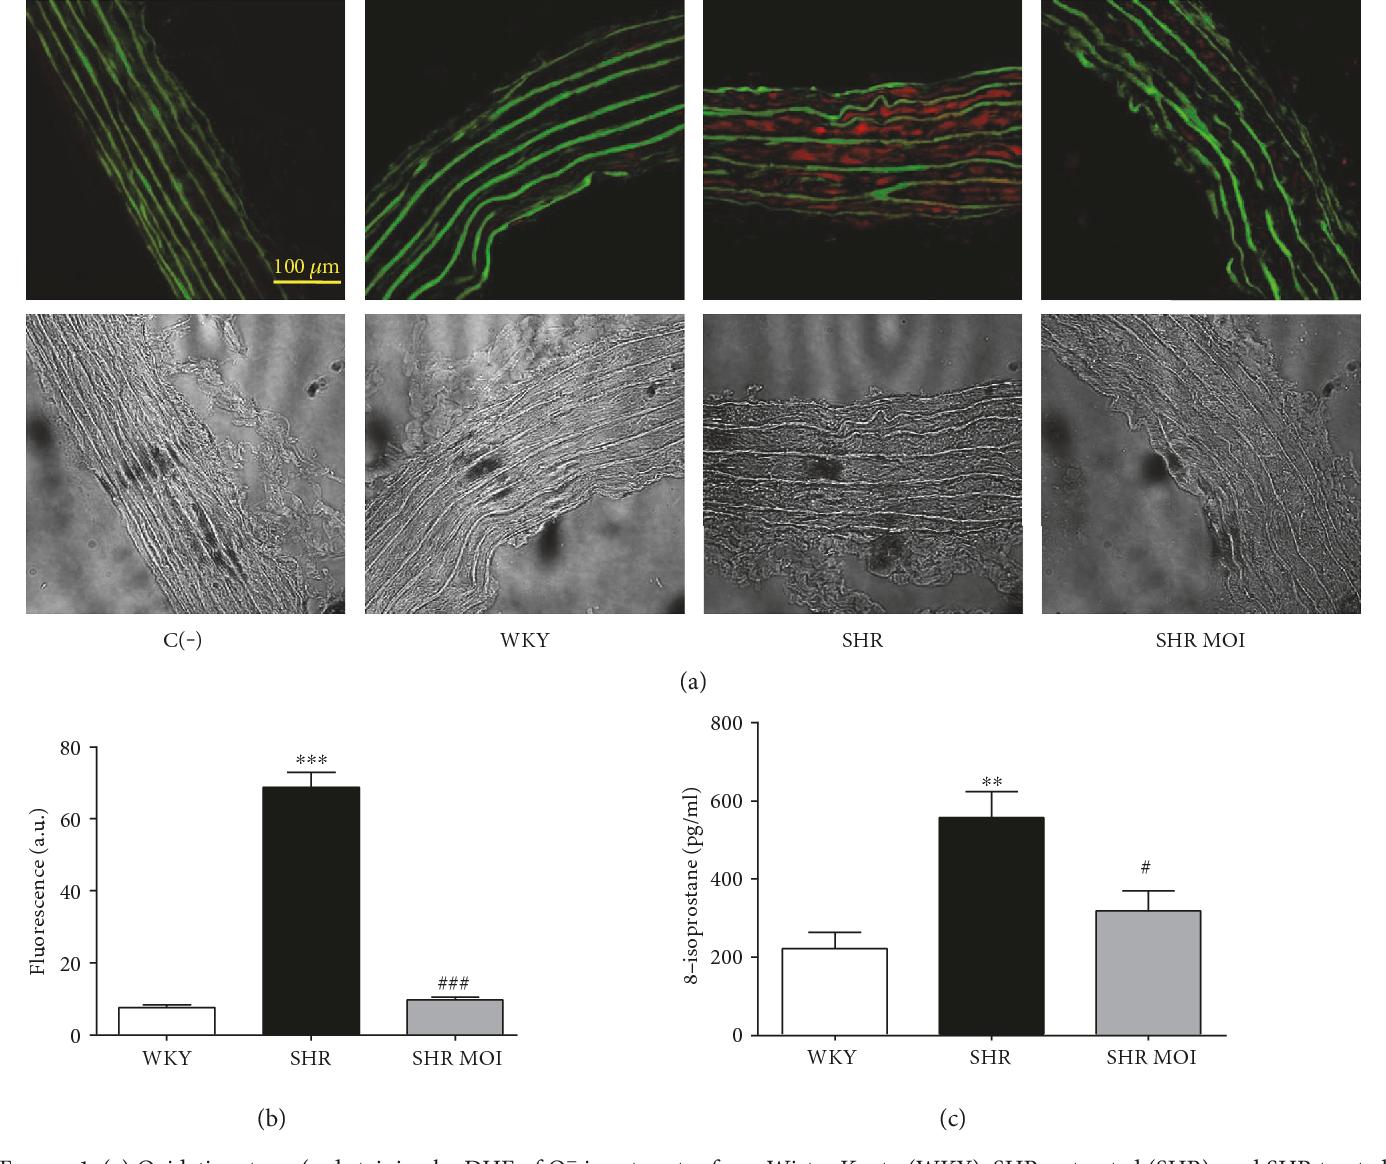 PDF] Moringa oleifera Seeds Attenuate Vascular Oxidative and